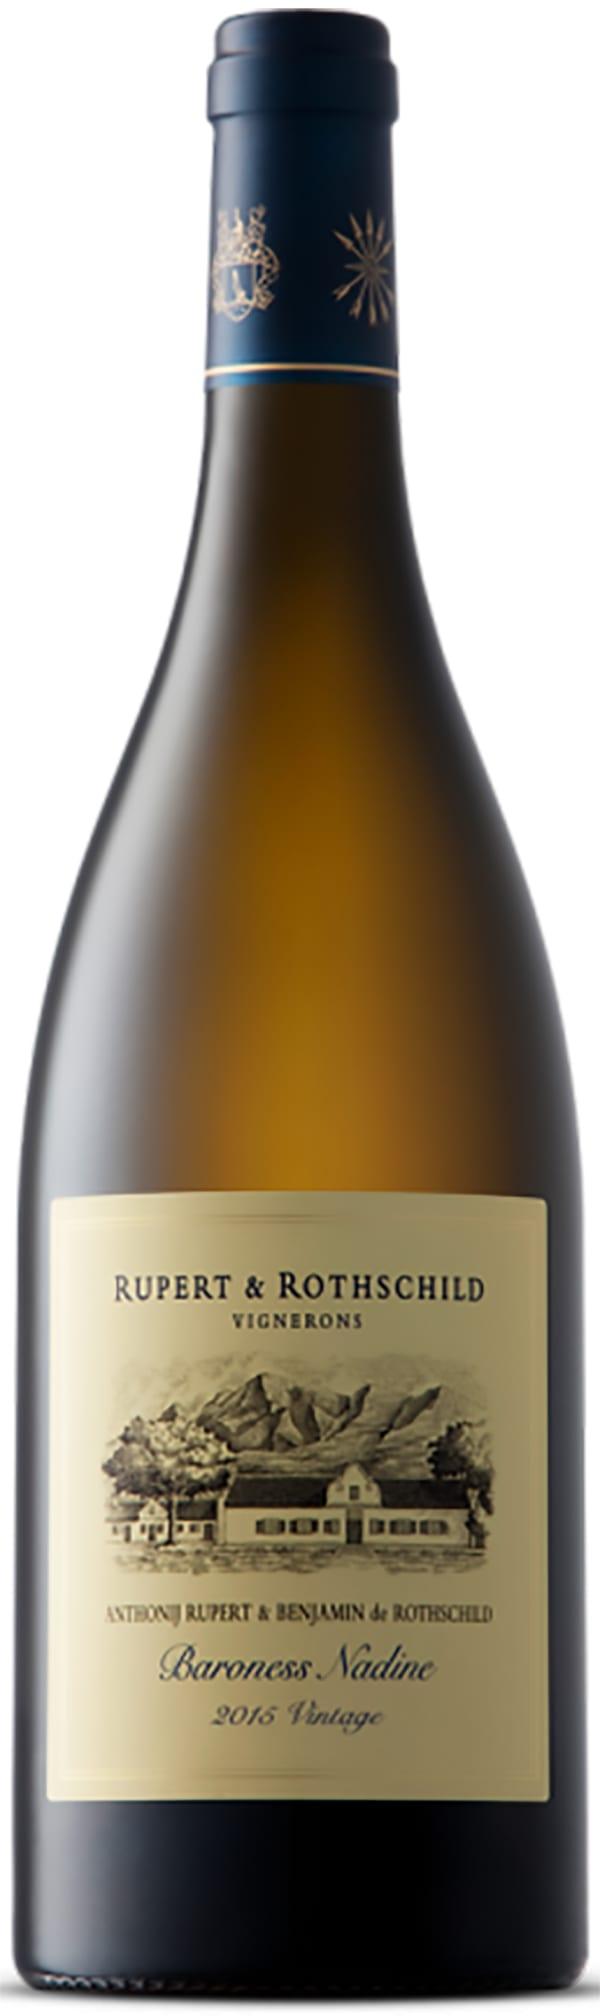 Rupert & Rothschild Chardonnay Baroness Nadine 2009